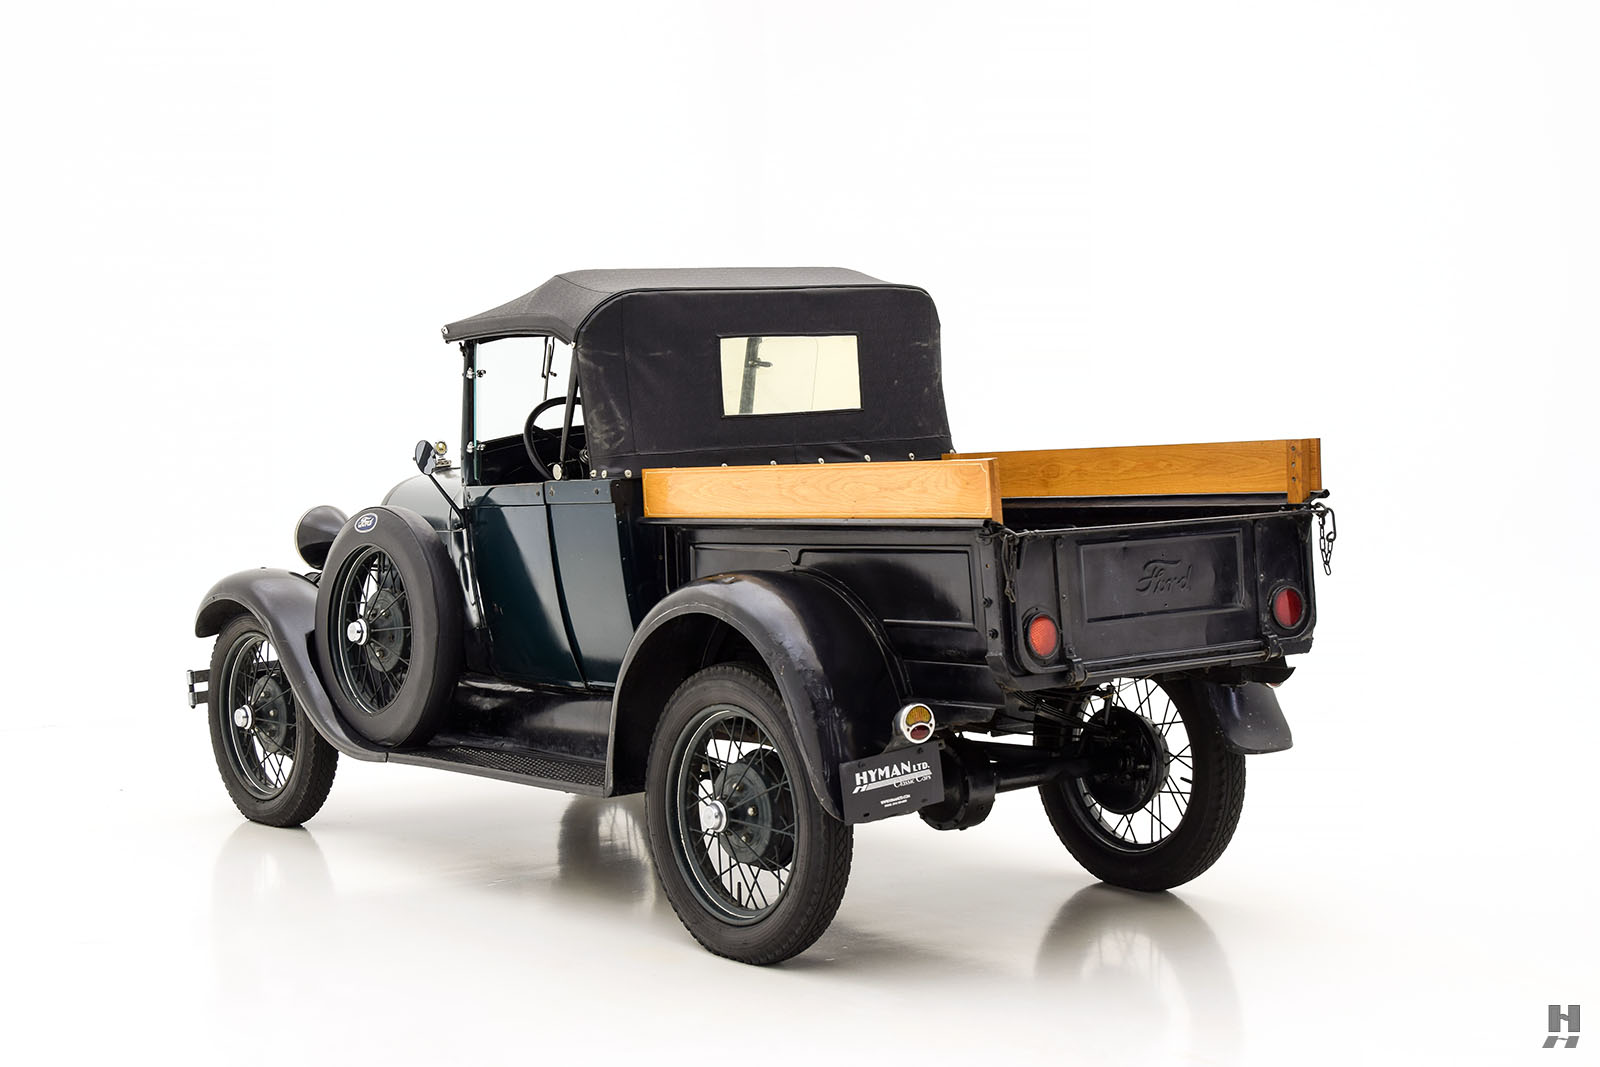 1929 ford model a roadster pick up for sale buy classic ford hyman ltd. Black Bedroom Furniture Sets. Home Design Ideas